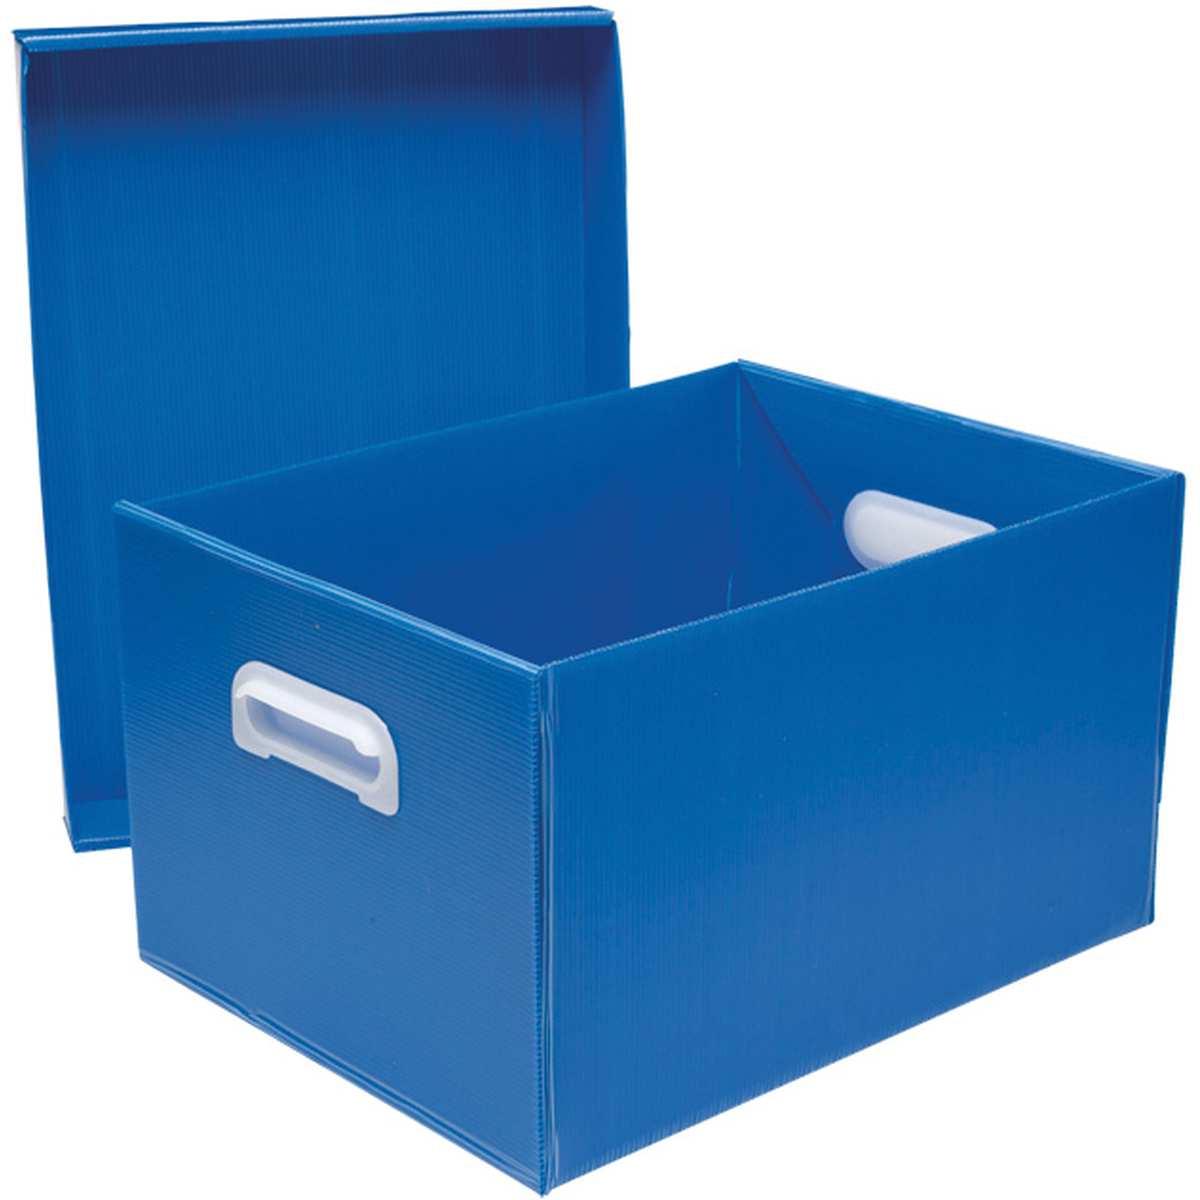 CAIXA ORGANIZADORA THE BEST BOX FOSCA 437 X 310 X 24 0MM AZUL